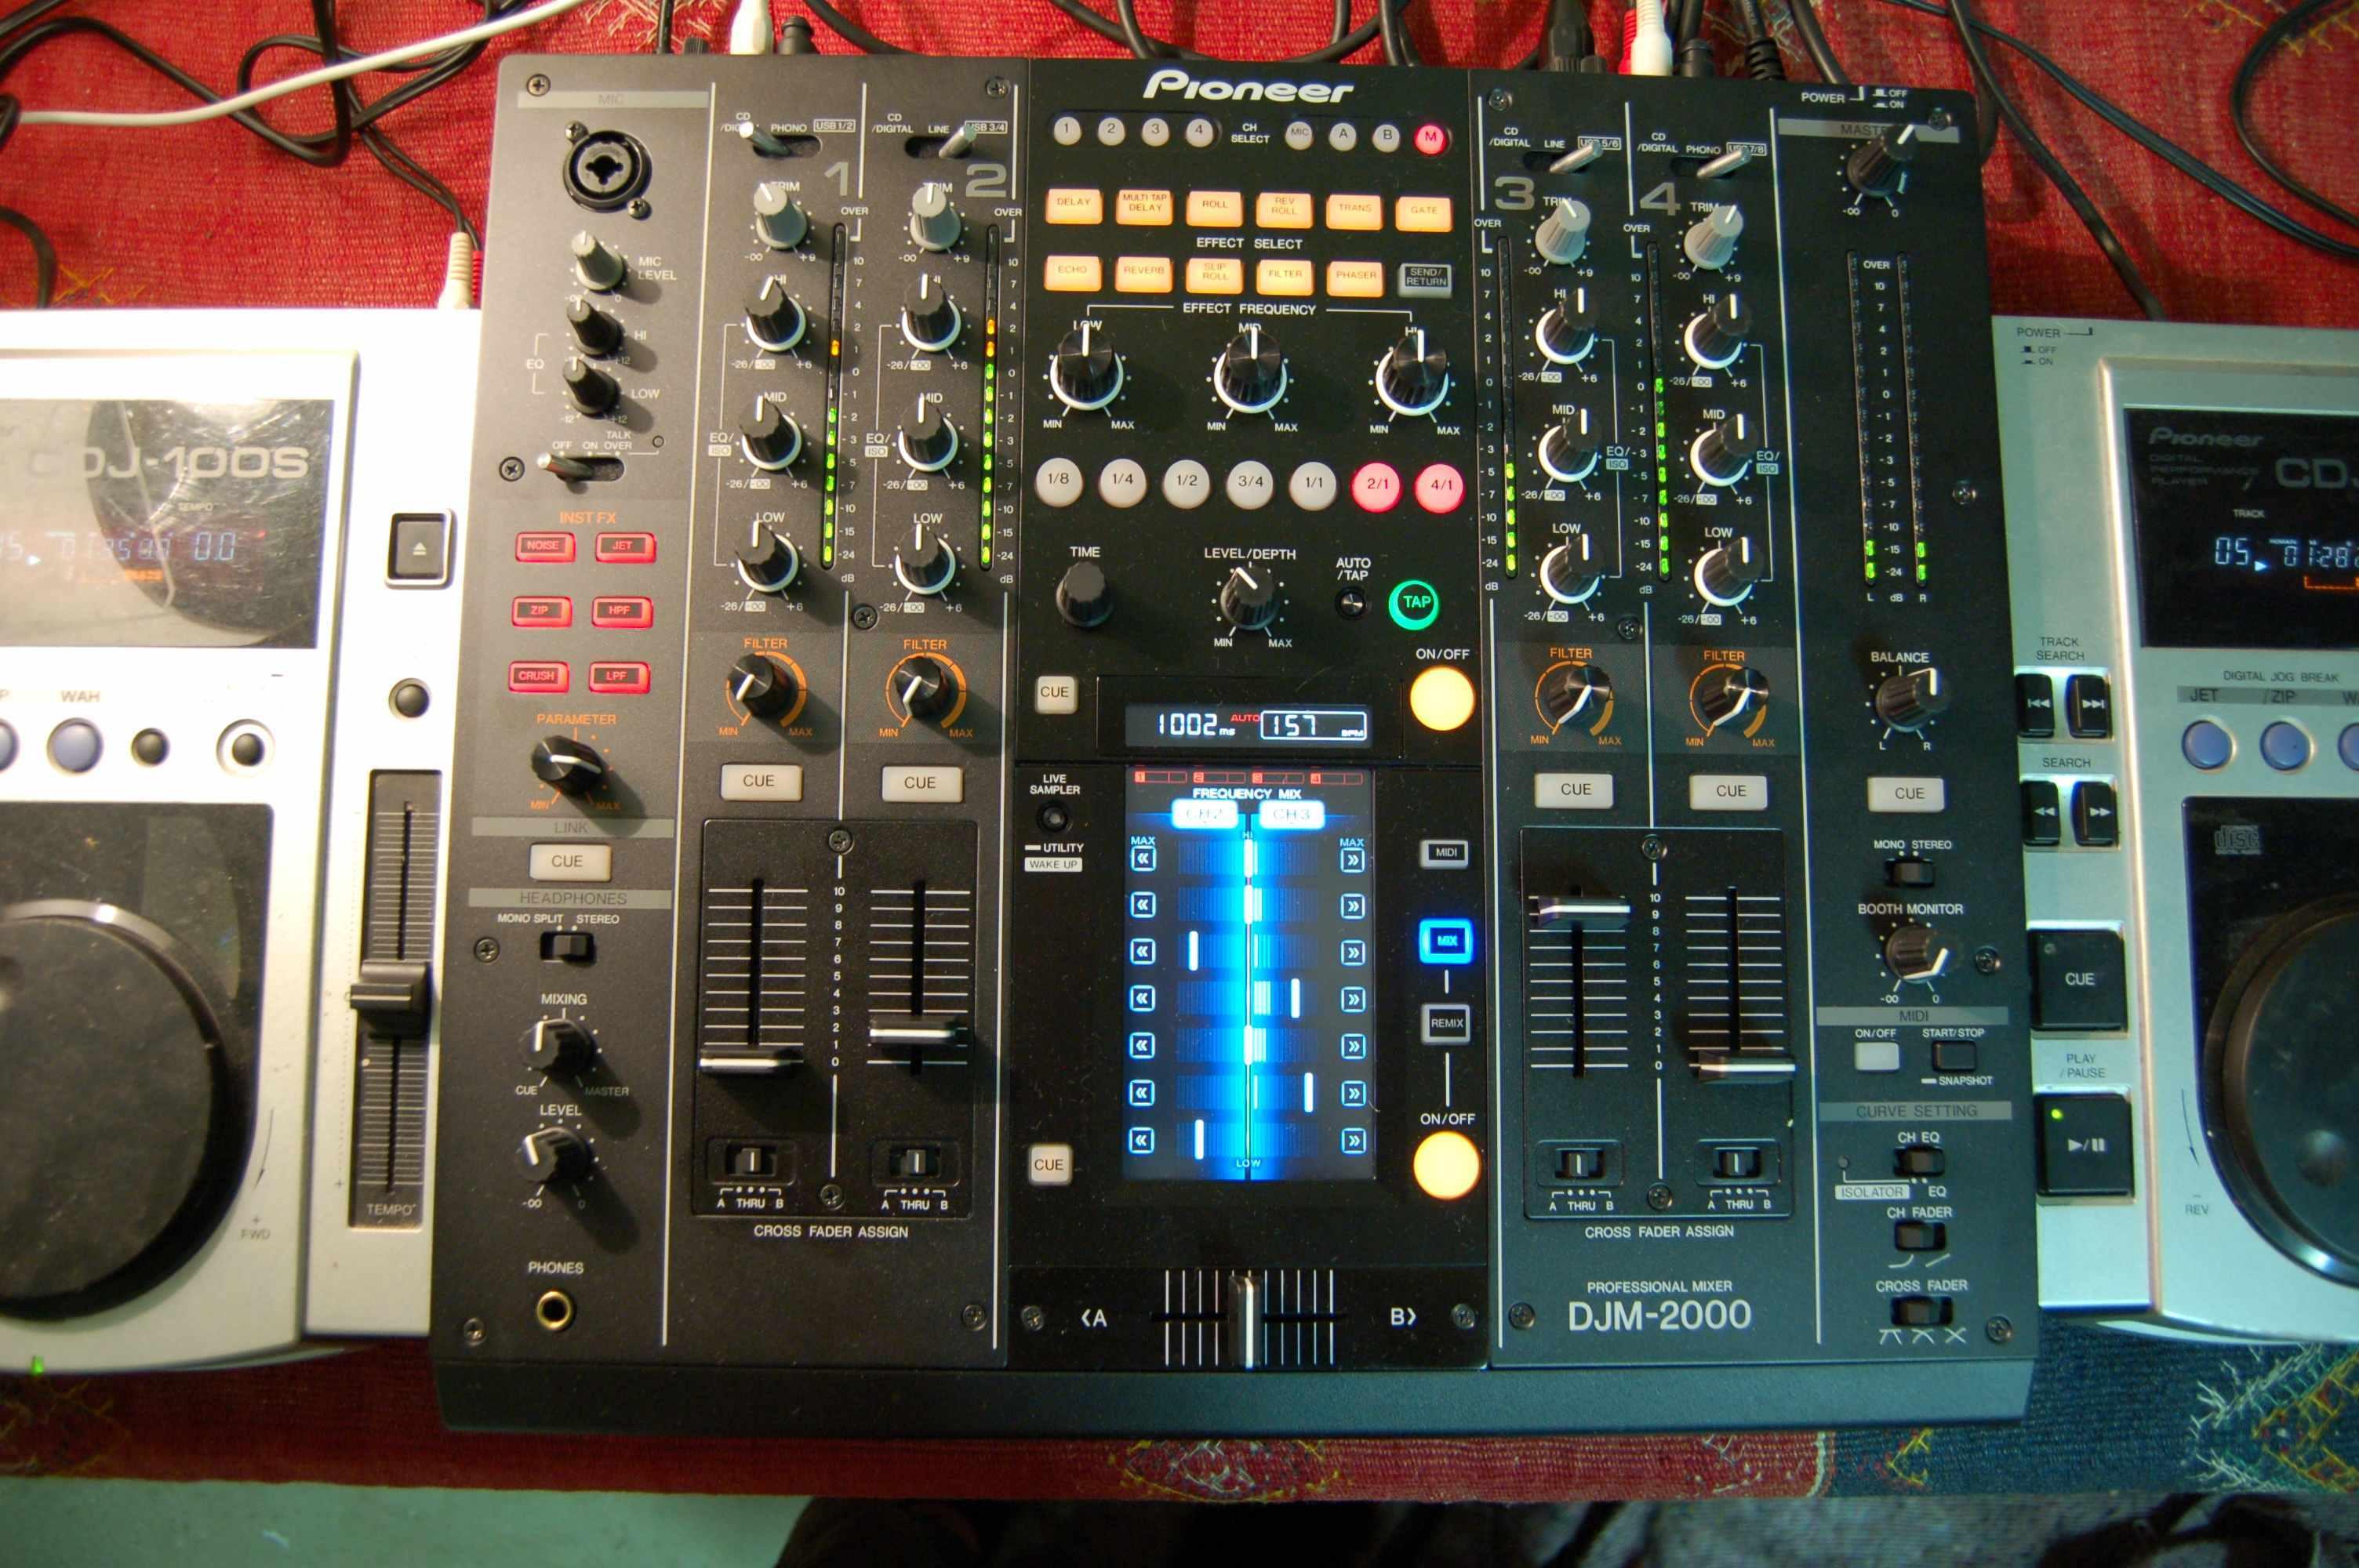 Achat occasion pioneer djm 2000 france audiofanzine - Table de mixage pioneer djm 2000 ...